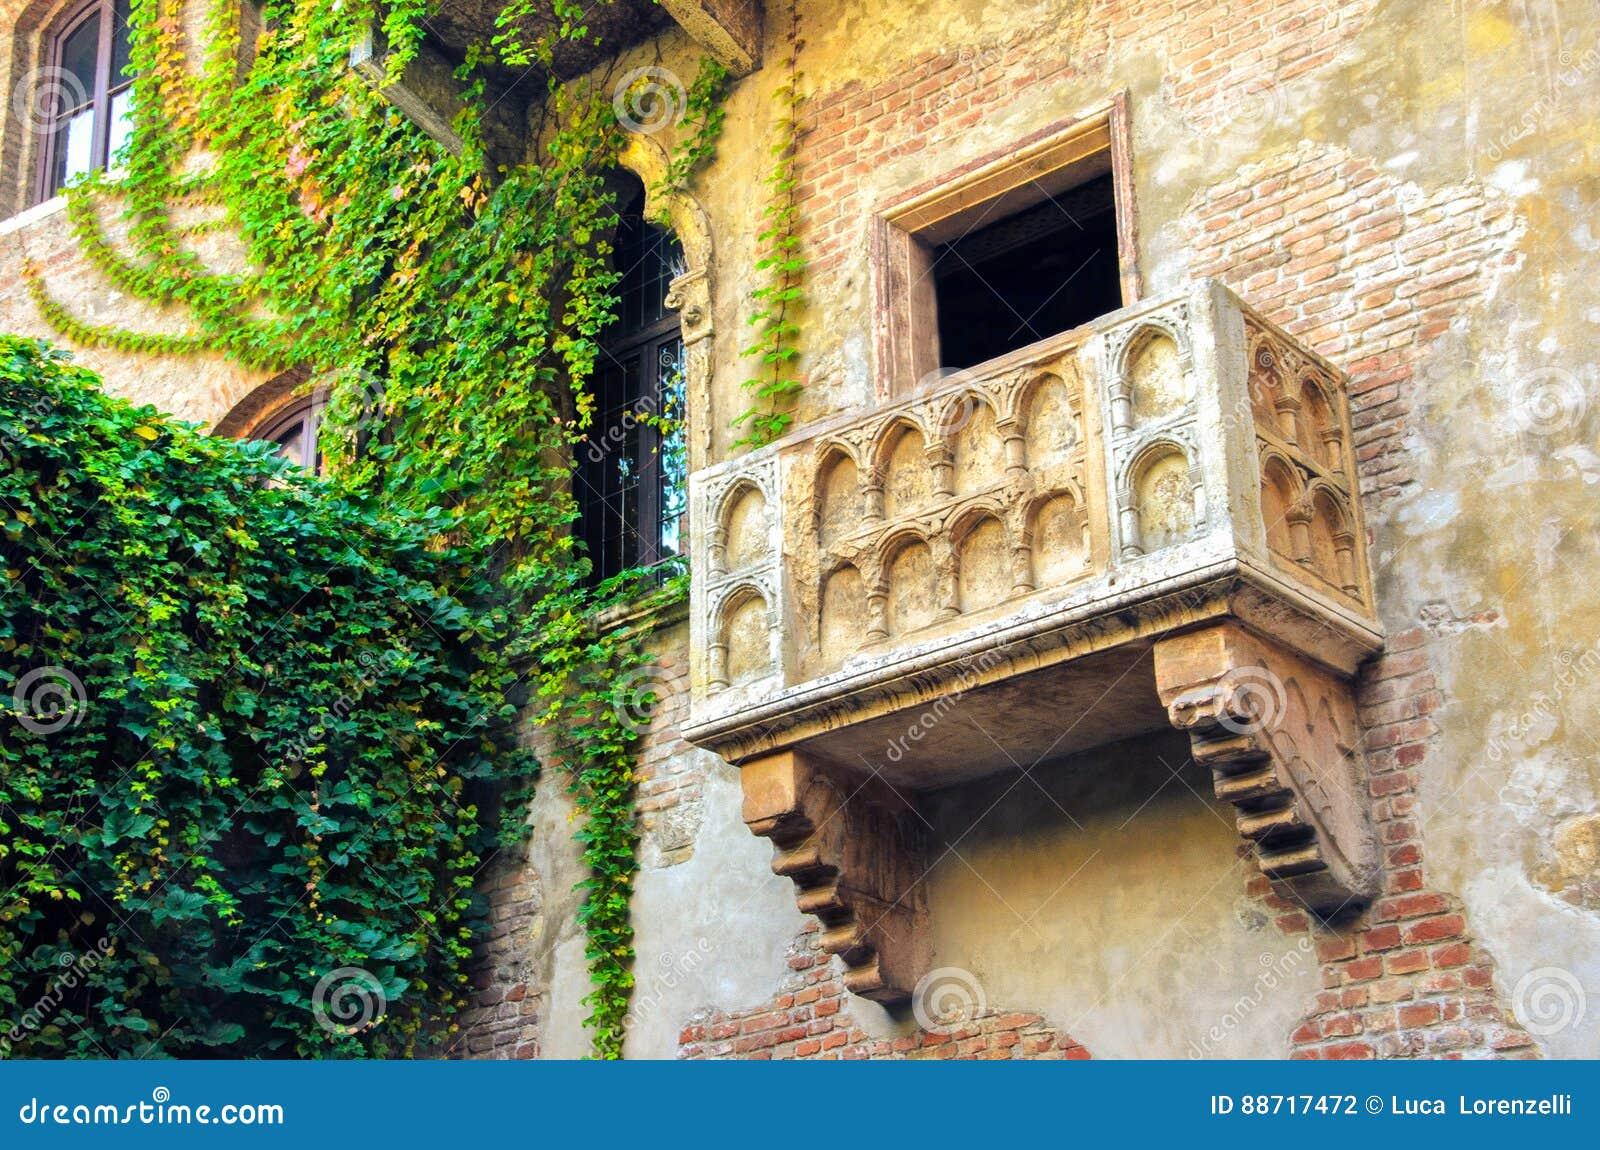 The Original Romeo And Juliet Balcony Located In Verona